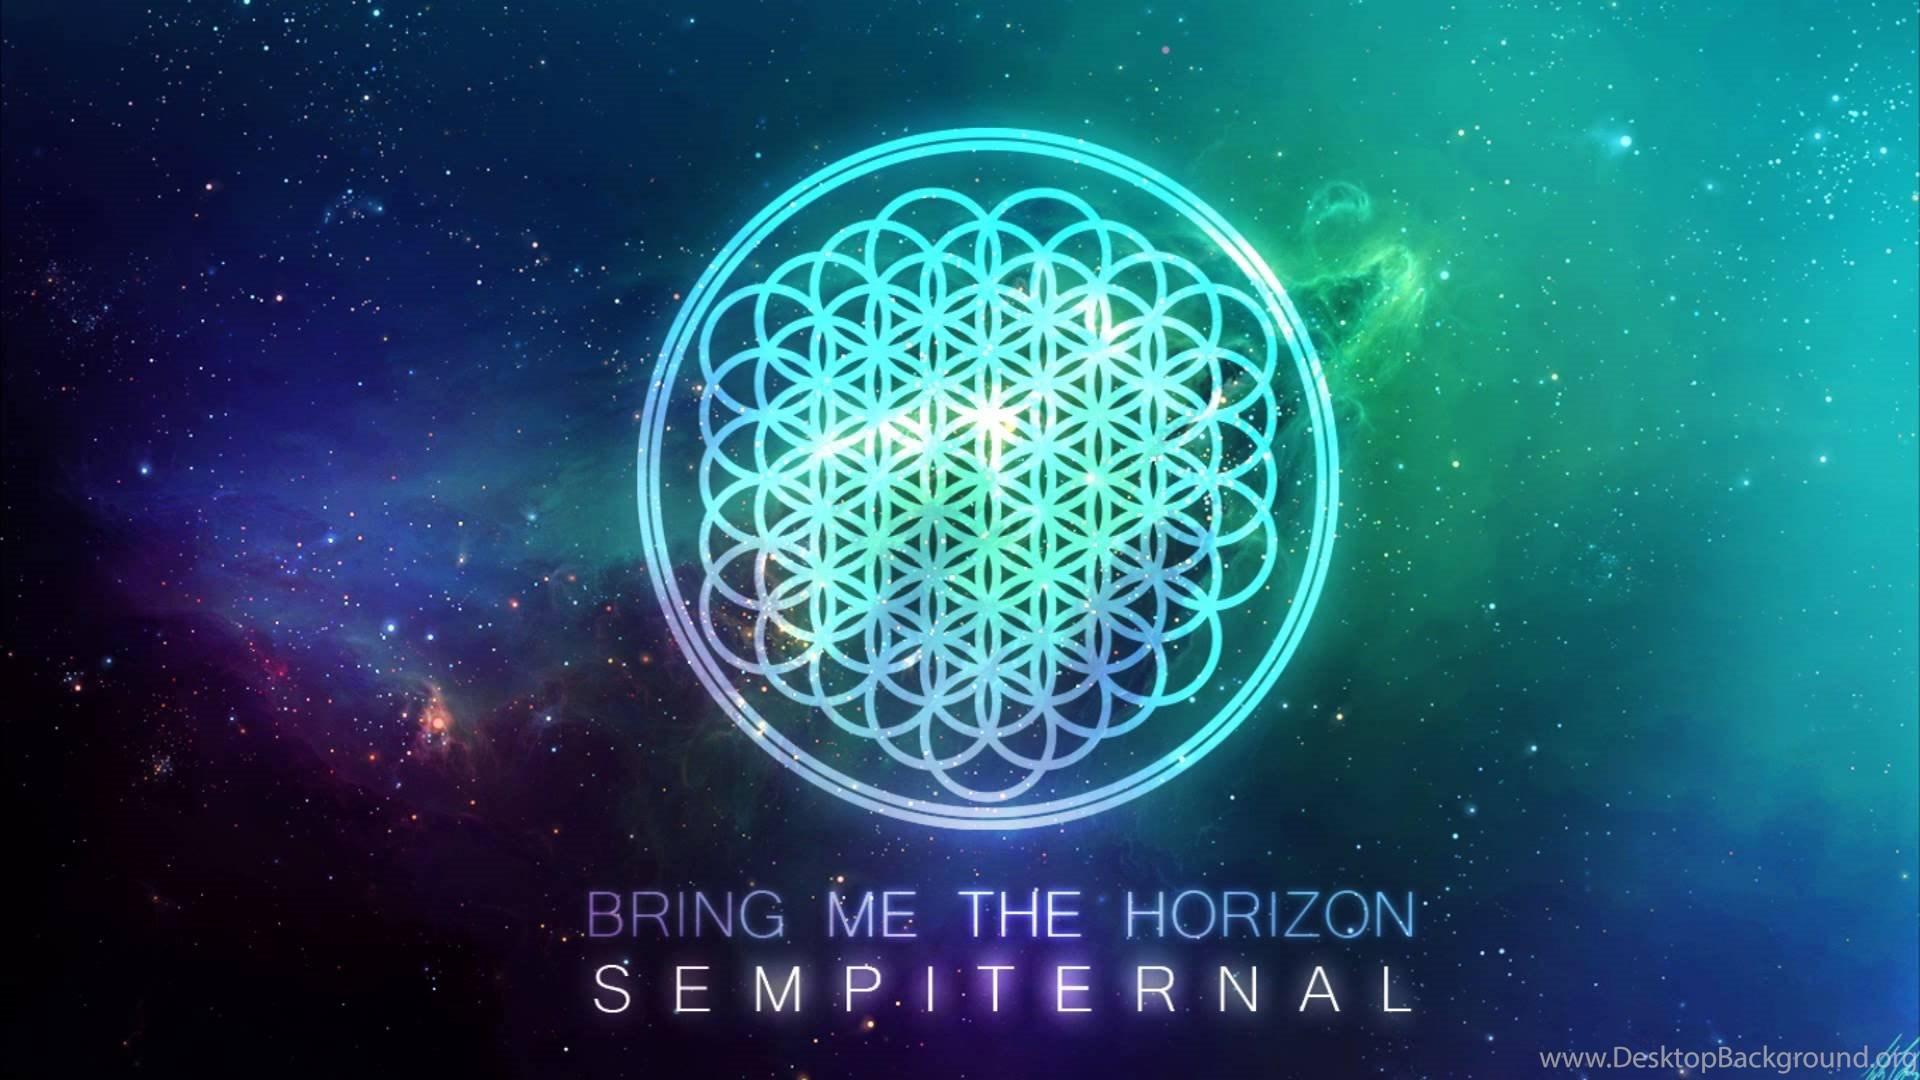 Bring Me The Horizon The Bedroom Sessions Album Wallpaper Desktop